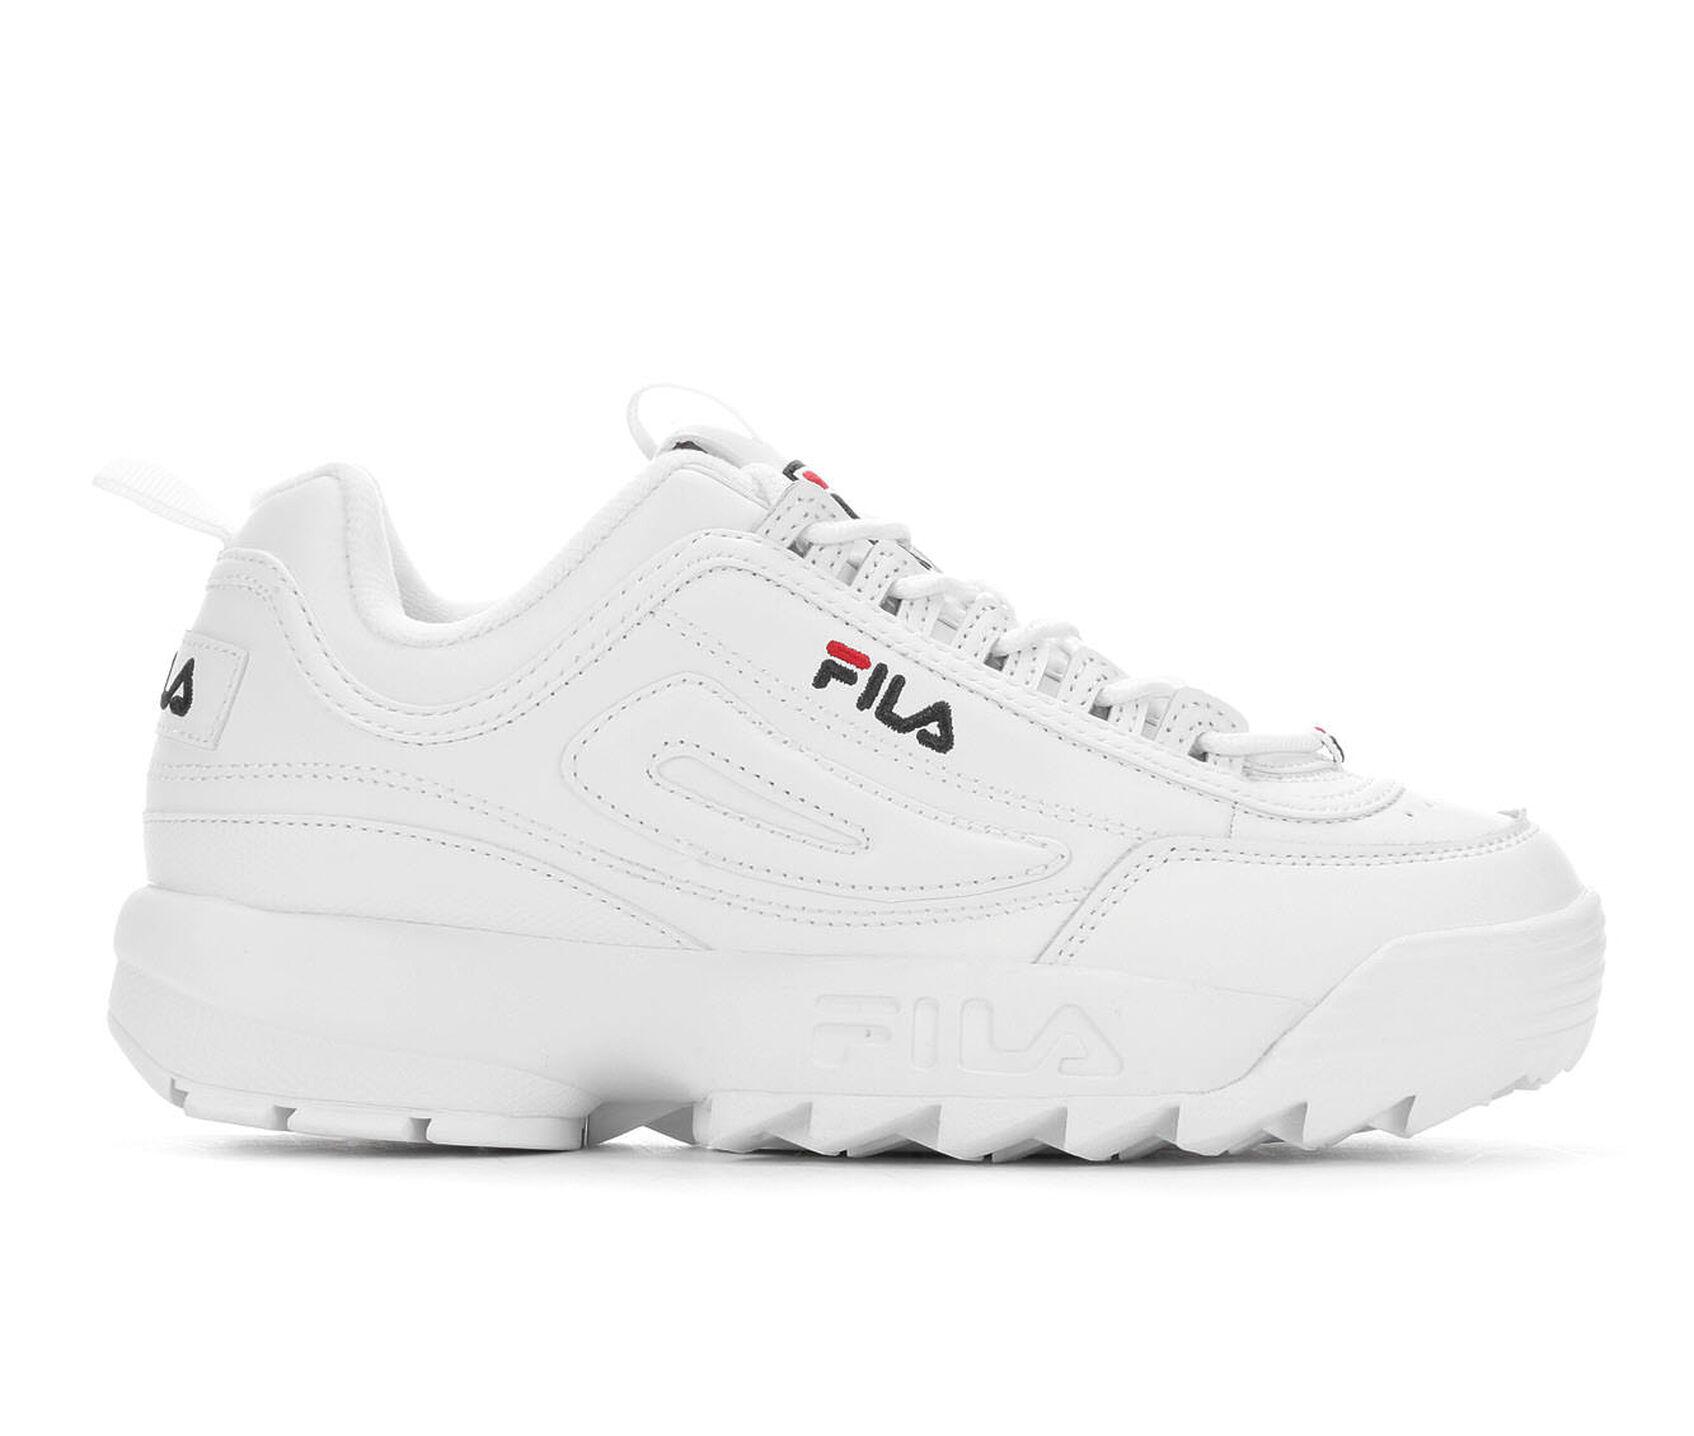 ... Fila Disruptor II Premium Sneakers. Carousel Controls d1f5612a40